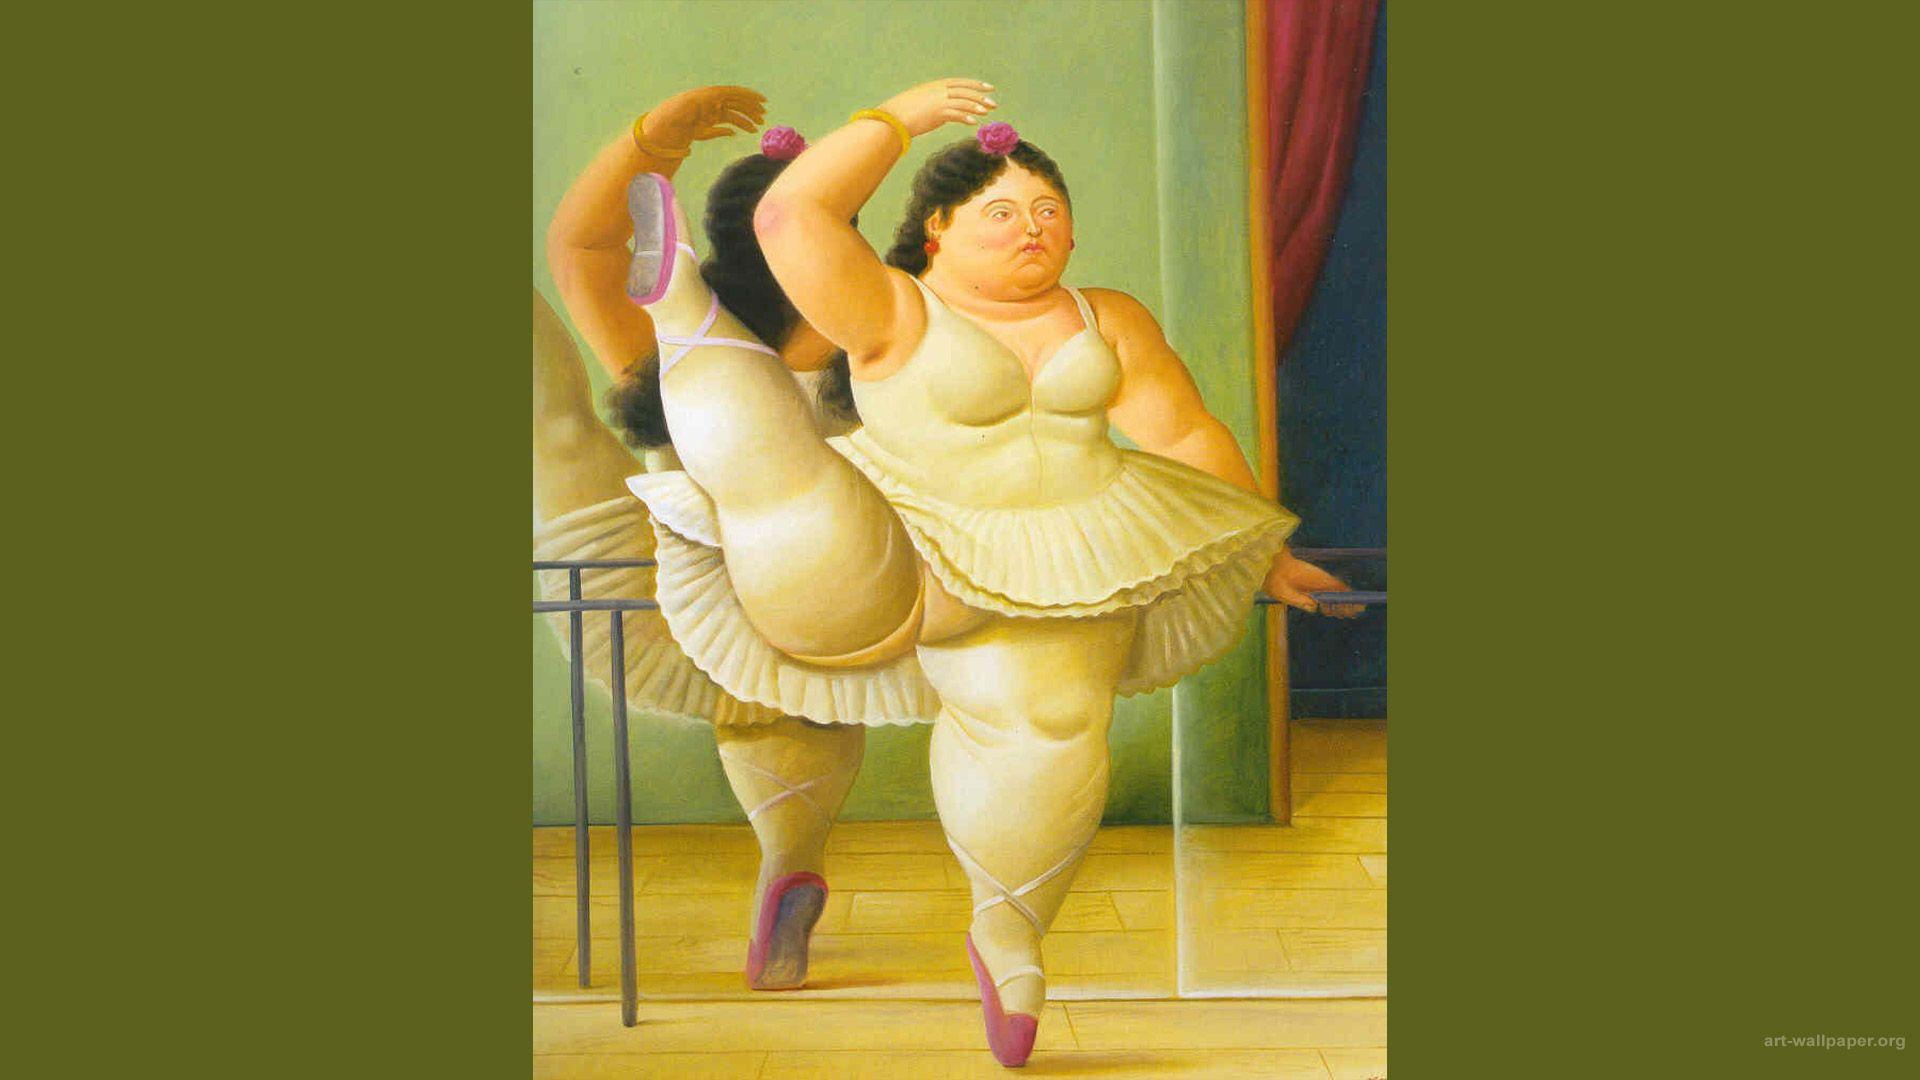 Bien-aimé Fernando Botero | Fernando Botero | Pinterest JL45